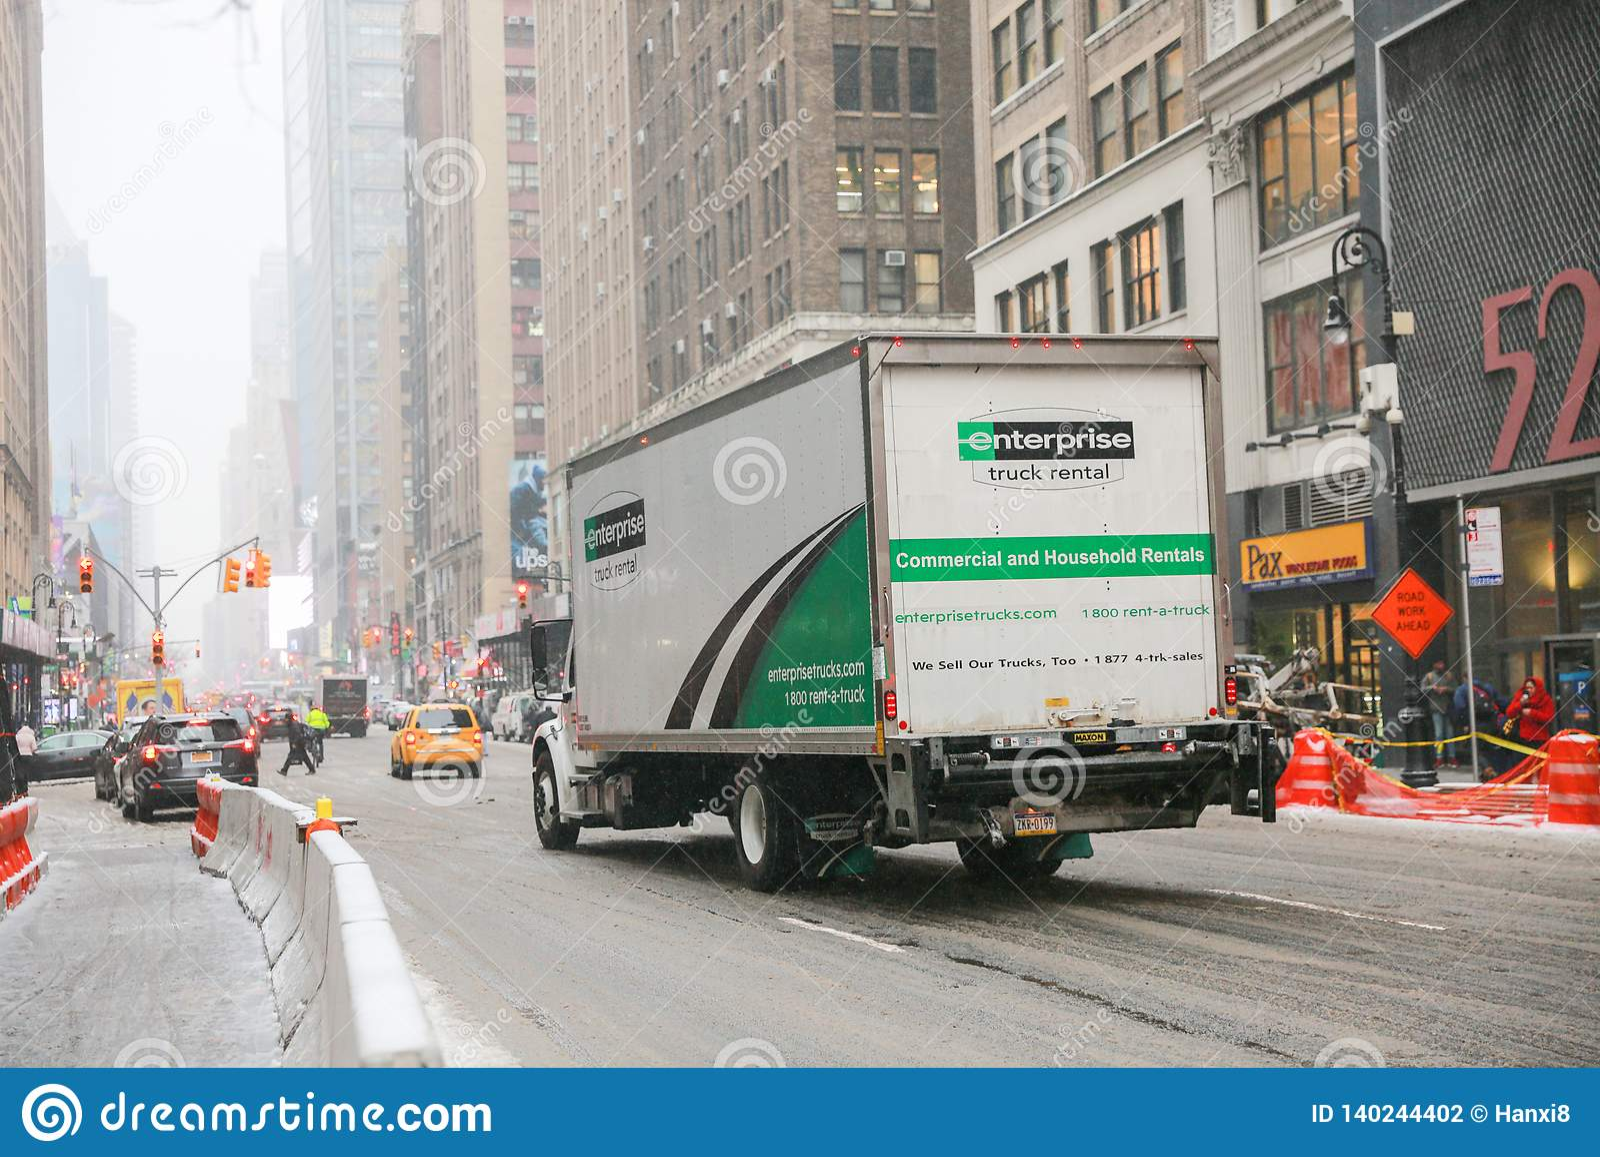 Enterprise Rental Truck In New York Editorial Photography